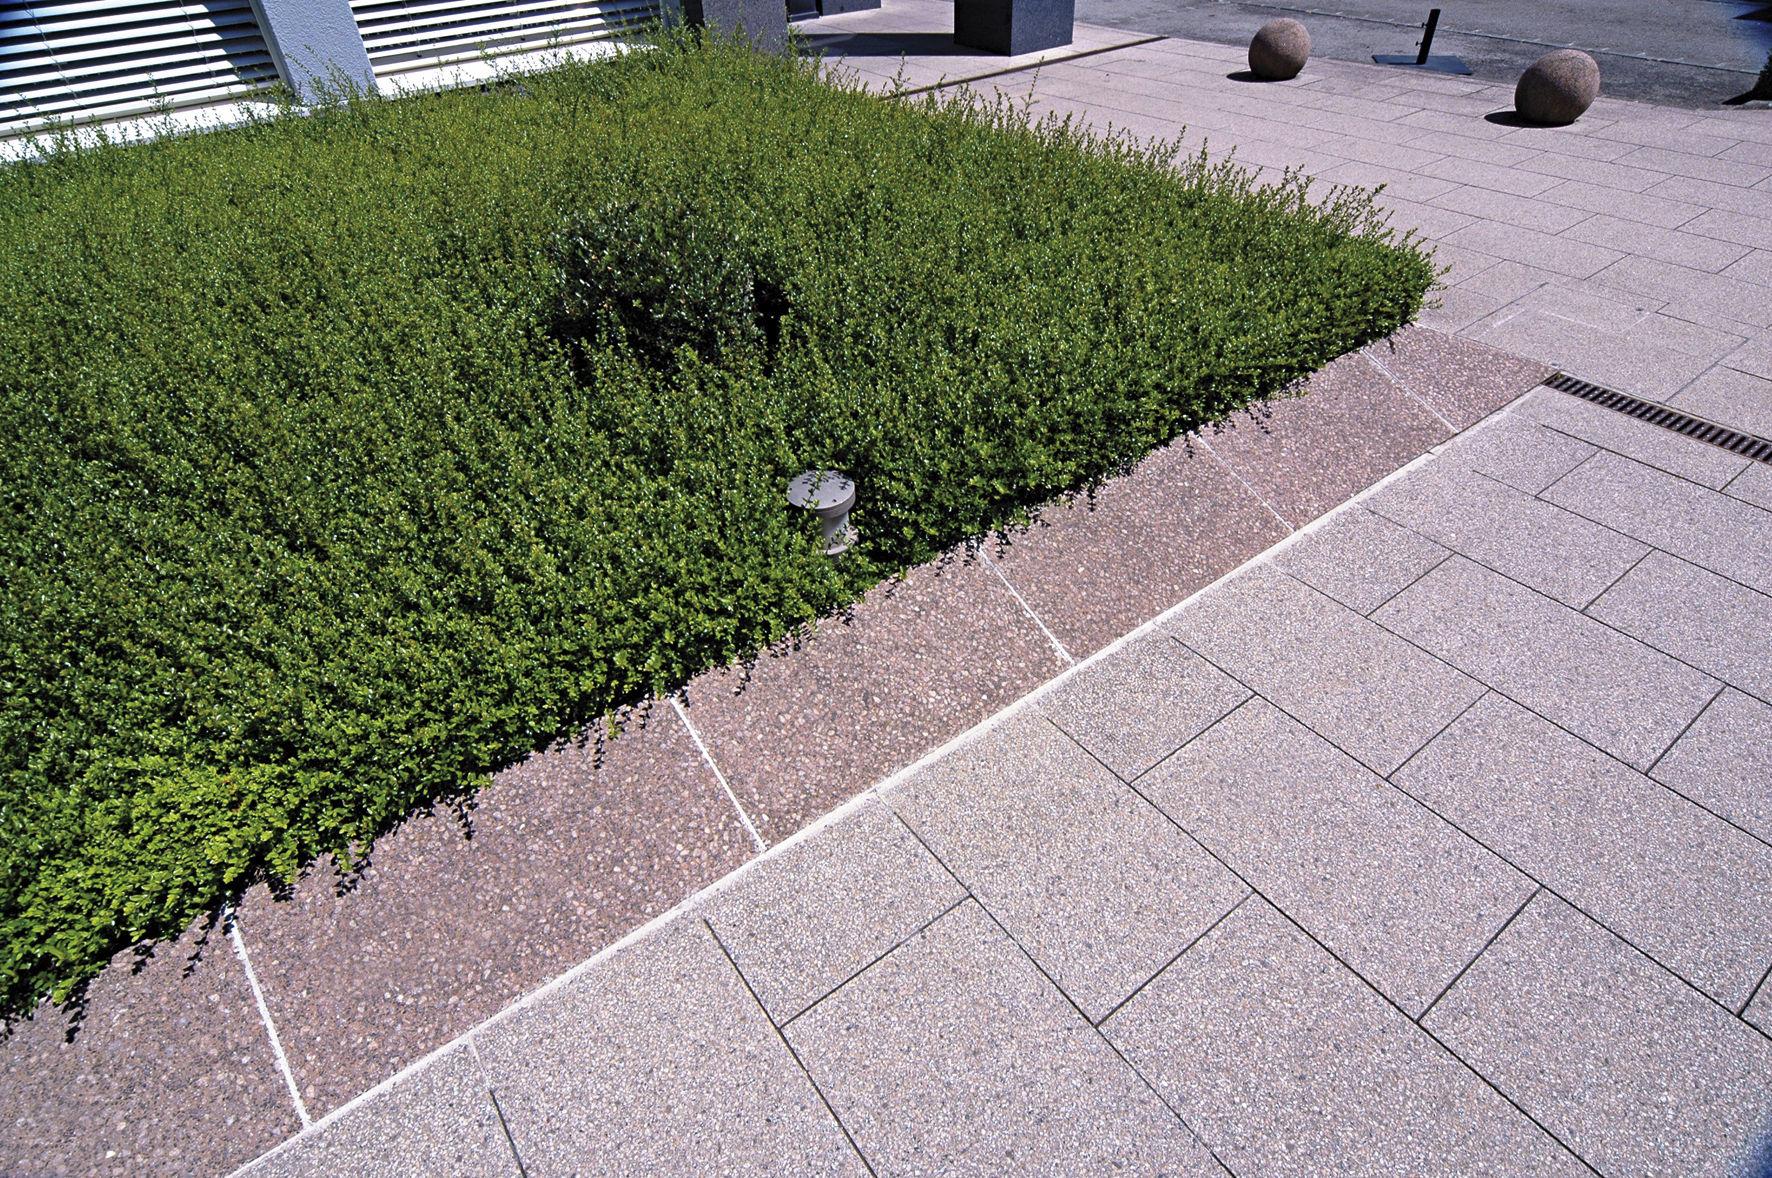 Bordure de jardin / en pierre reconstituée / linéaire - CANOPEE ...